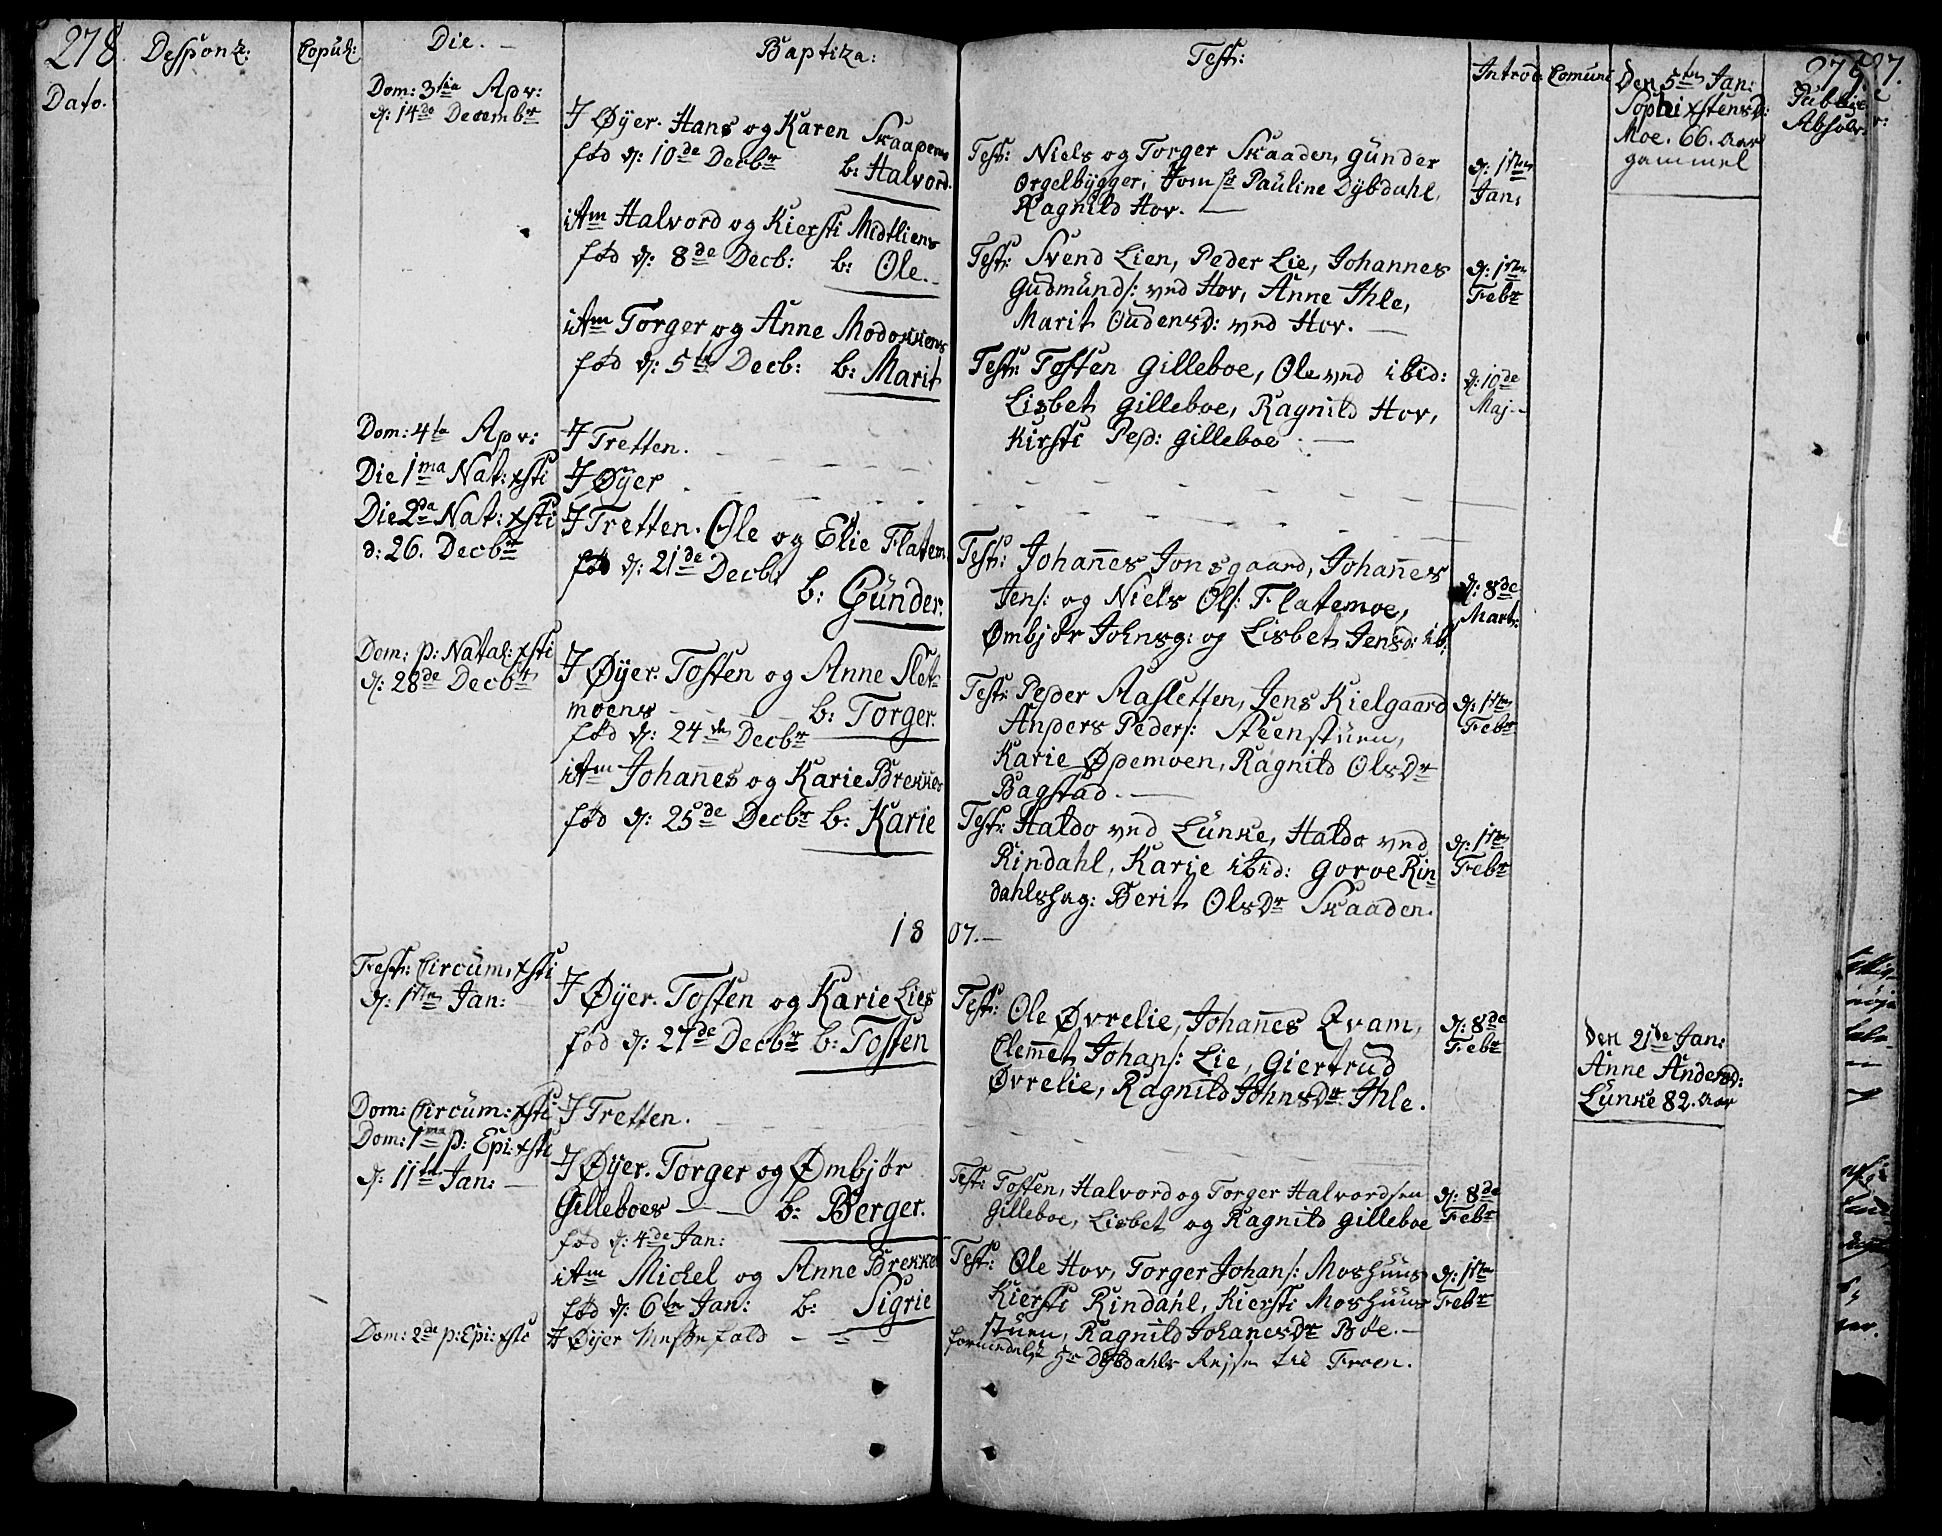 SAH, Øyer prestekontor, Ministerialbok nr. 3, 1784-1824, s. 278-279